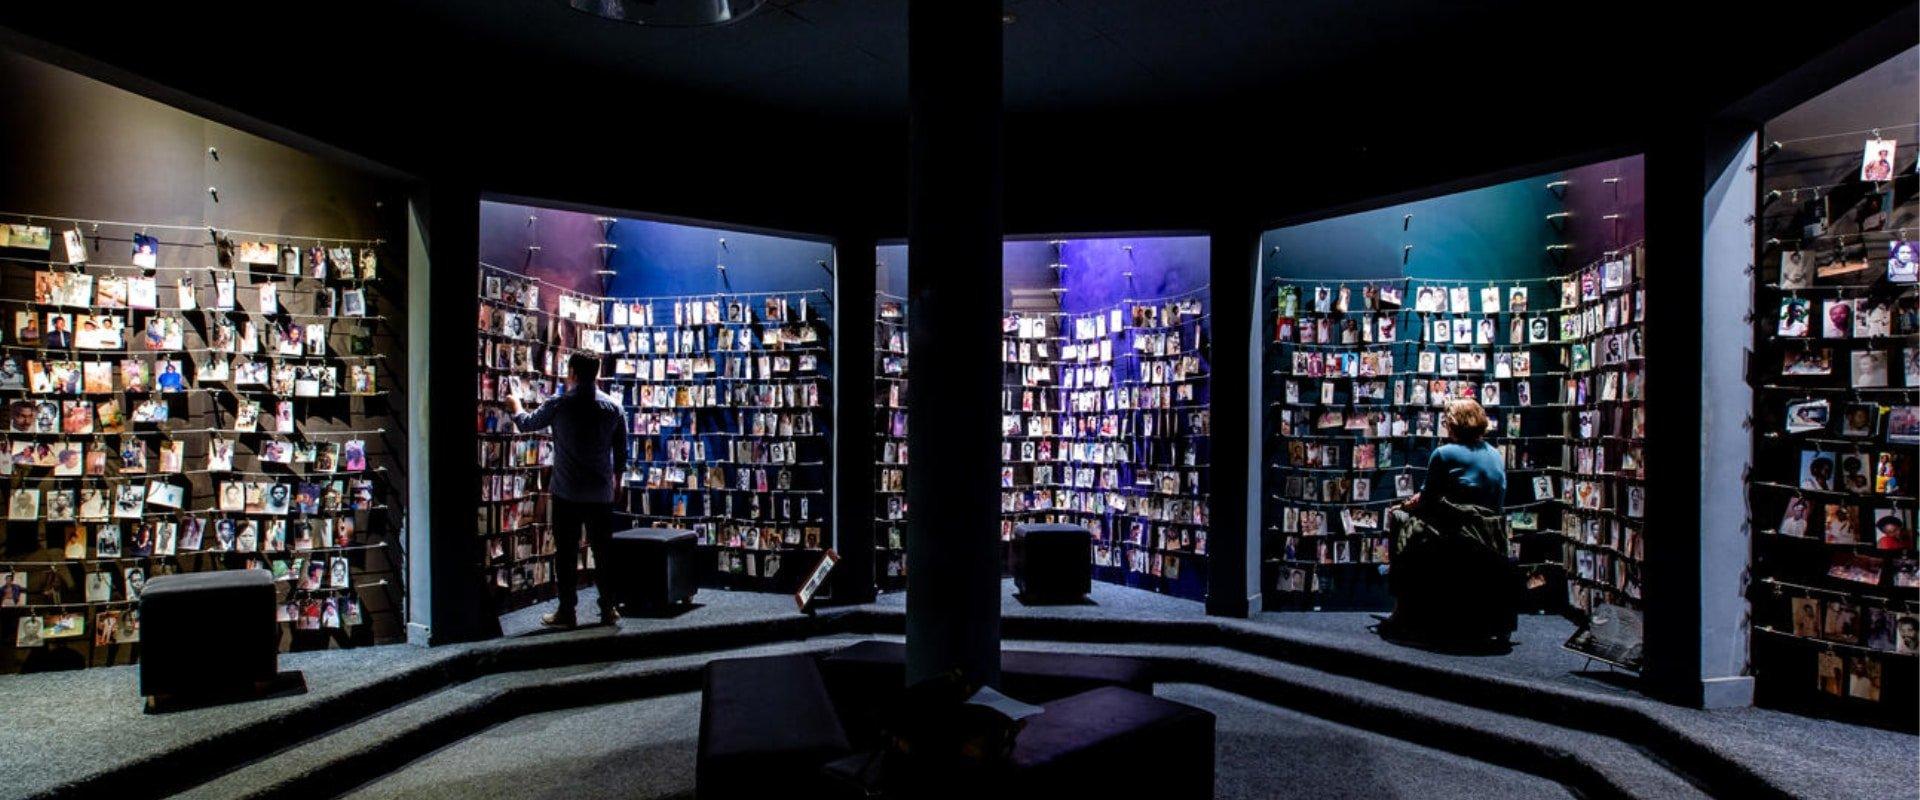 Visit a Genocide Museum